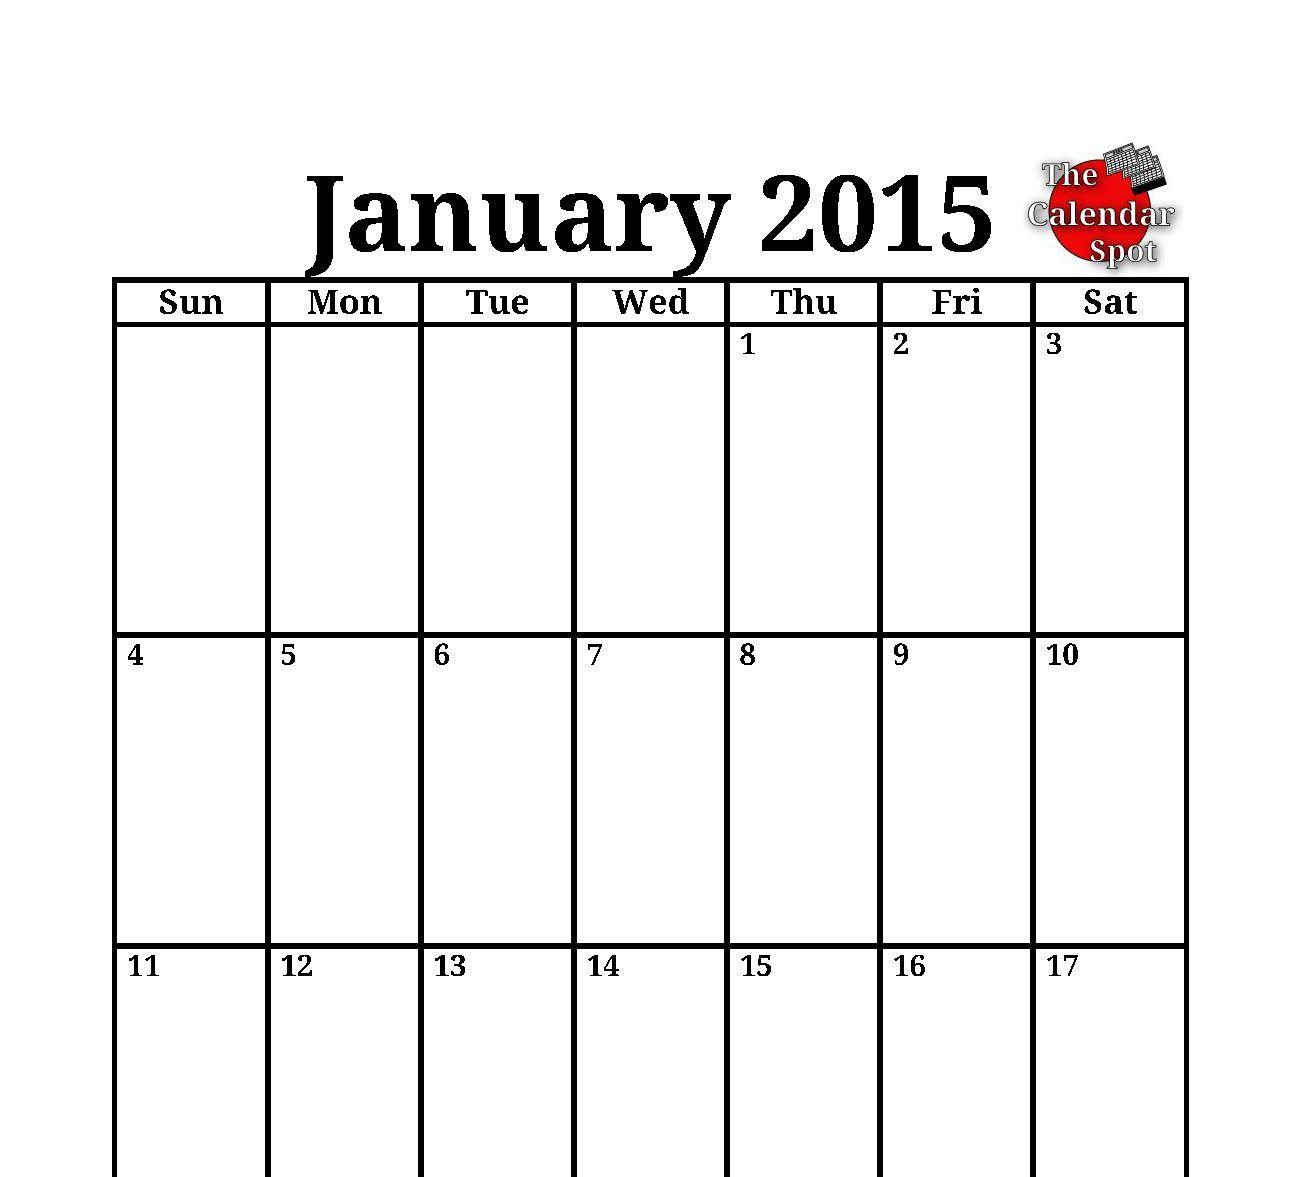 january 2018 calendars the calendar spot